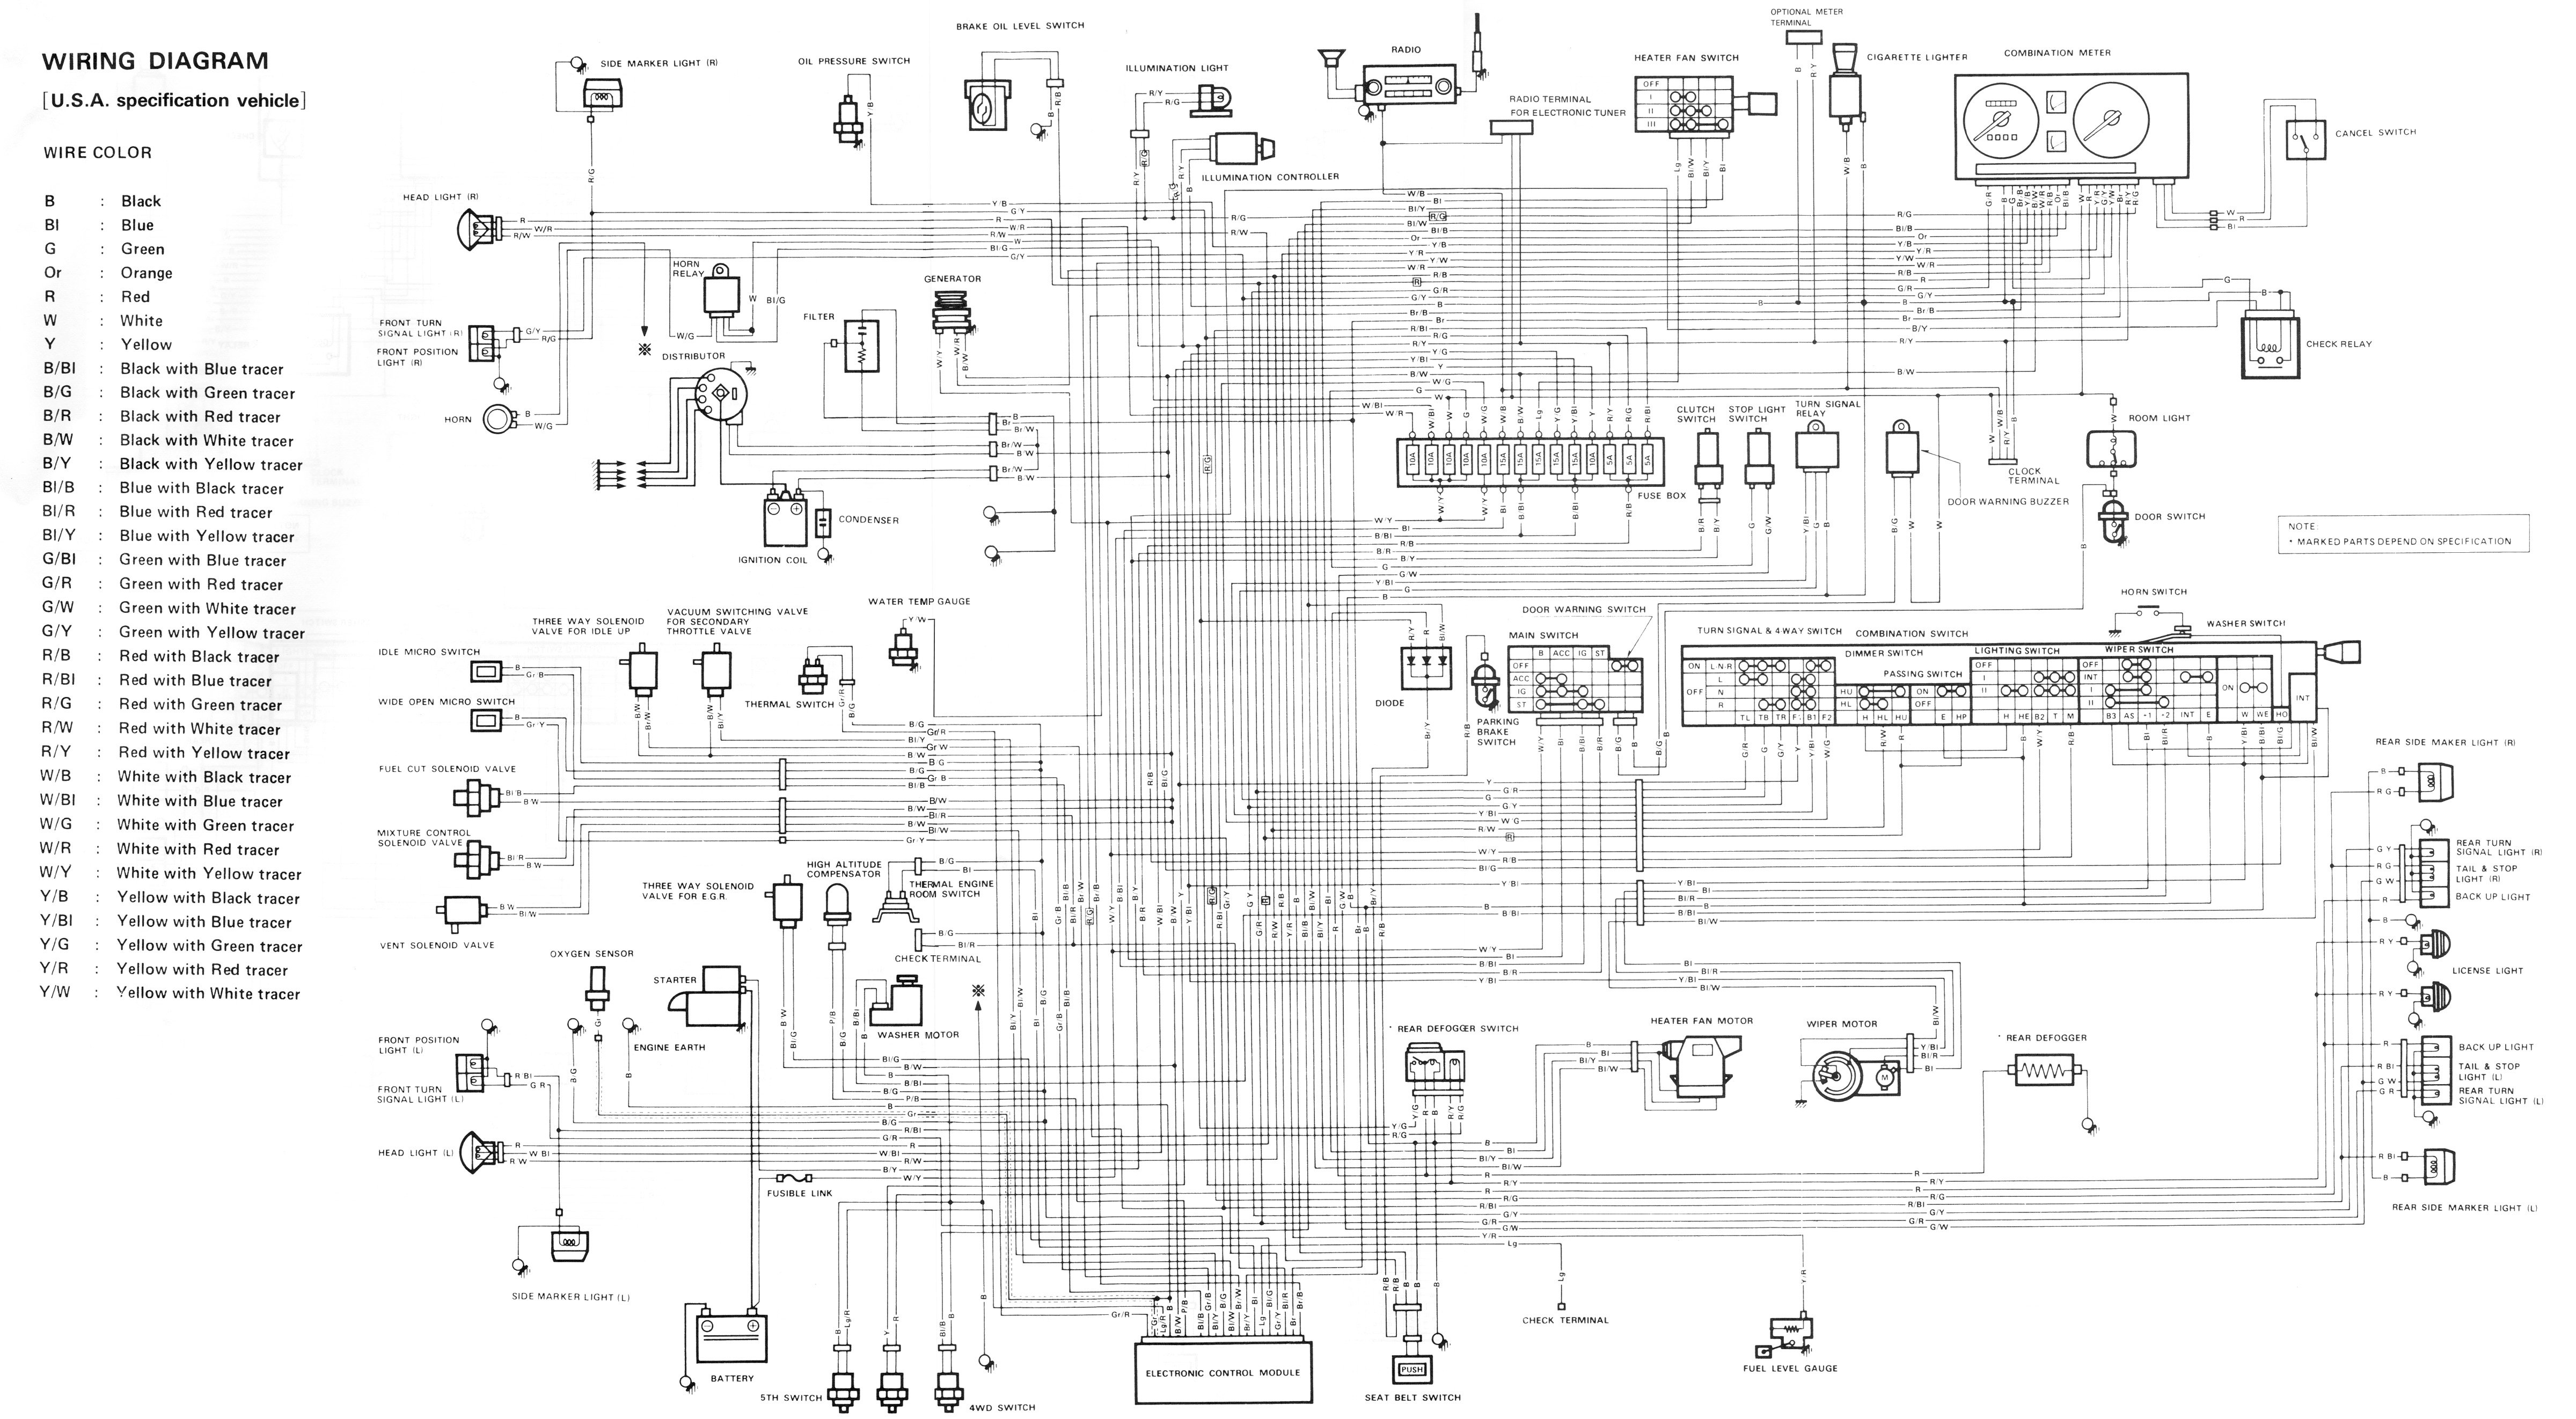 1993 geo metro wiring diagram wiring solutions rh rausco com 1997 geo tracker wiring diagram 1997 geo tracker wiring diagram